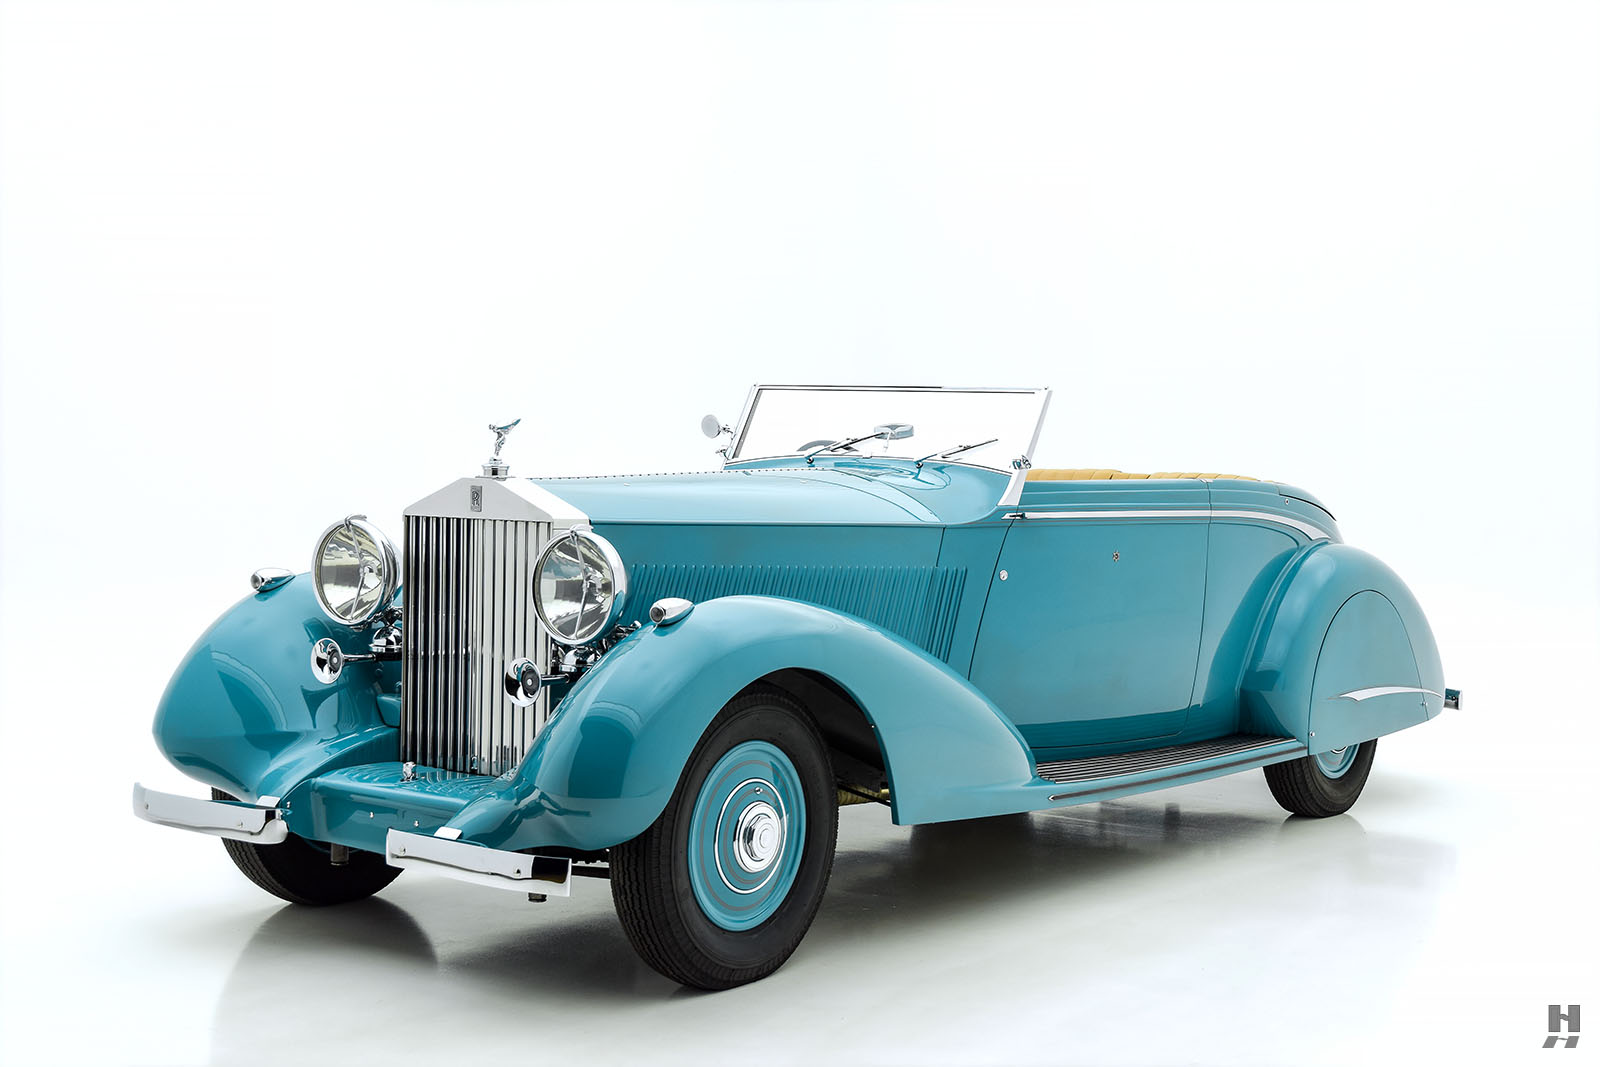 1937 Rolls-Royce Phantom III Drop Head Coupe For Sale at Hyman LTD